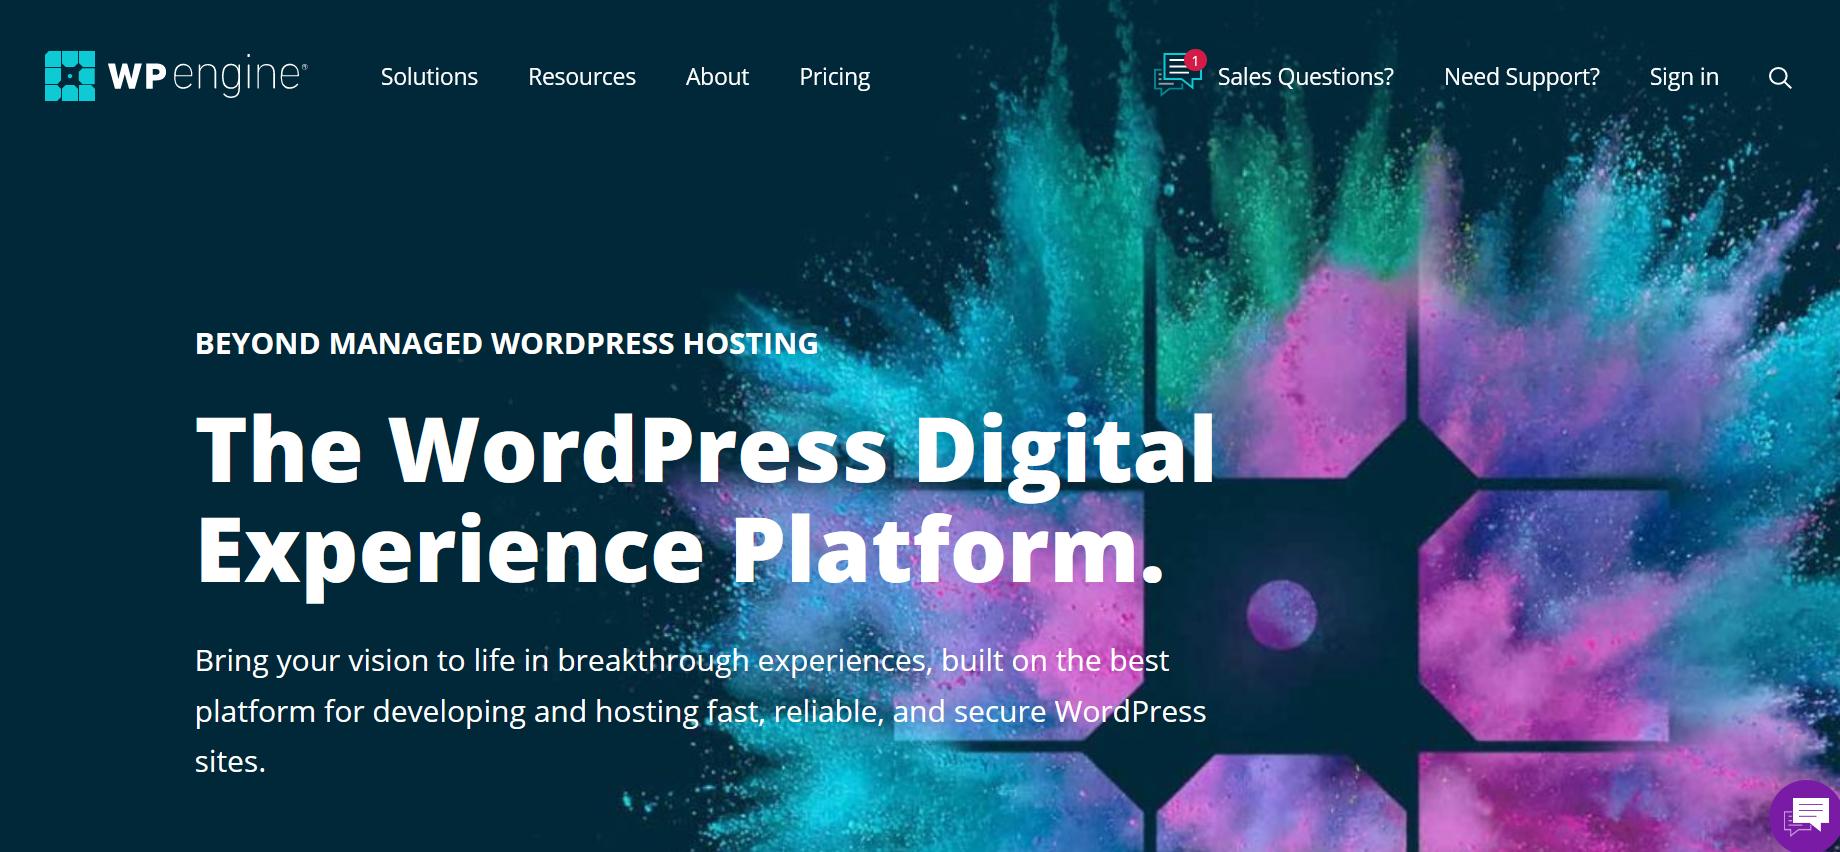 WordPress Hosting Services - wp engine